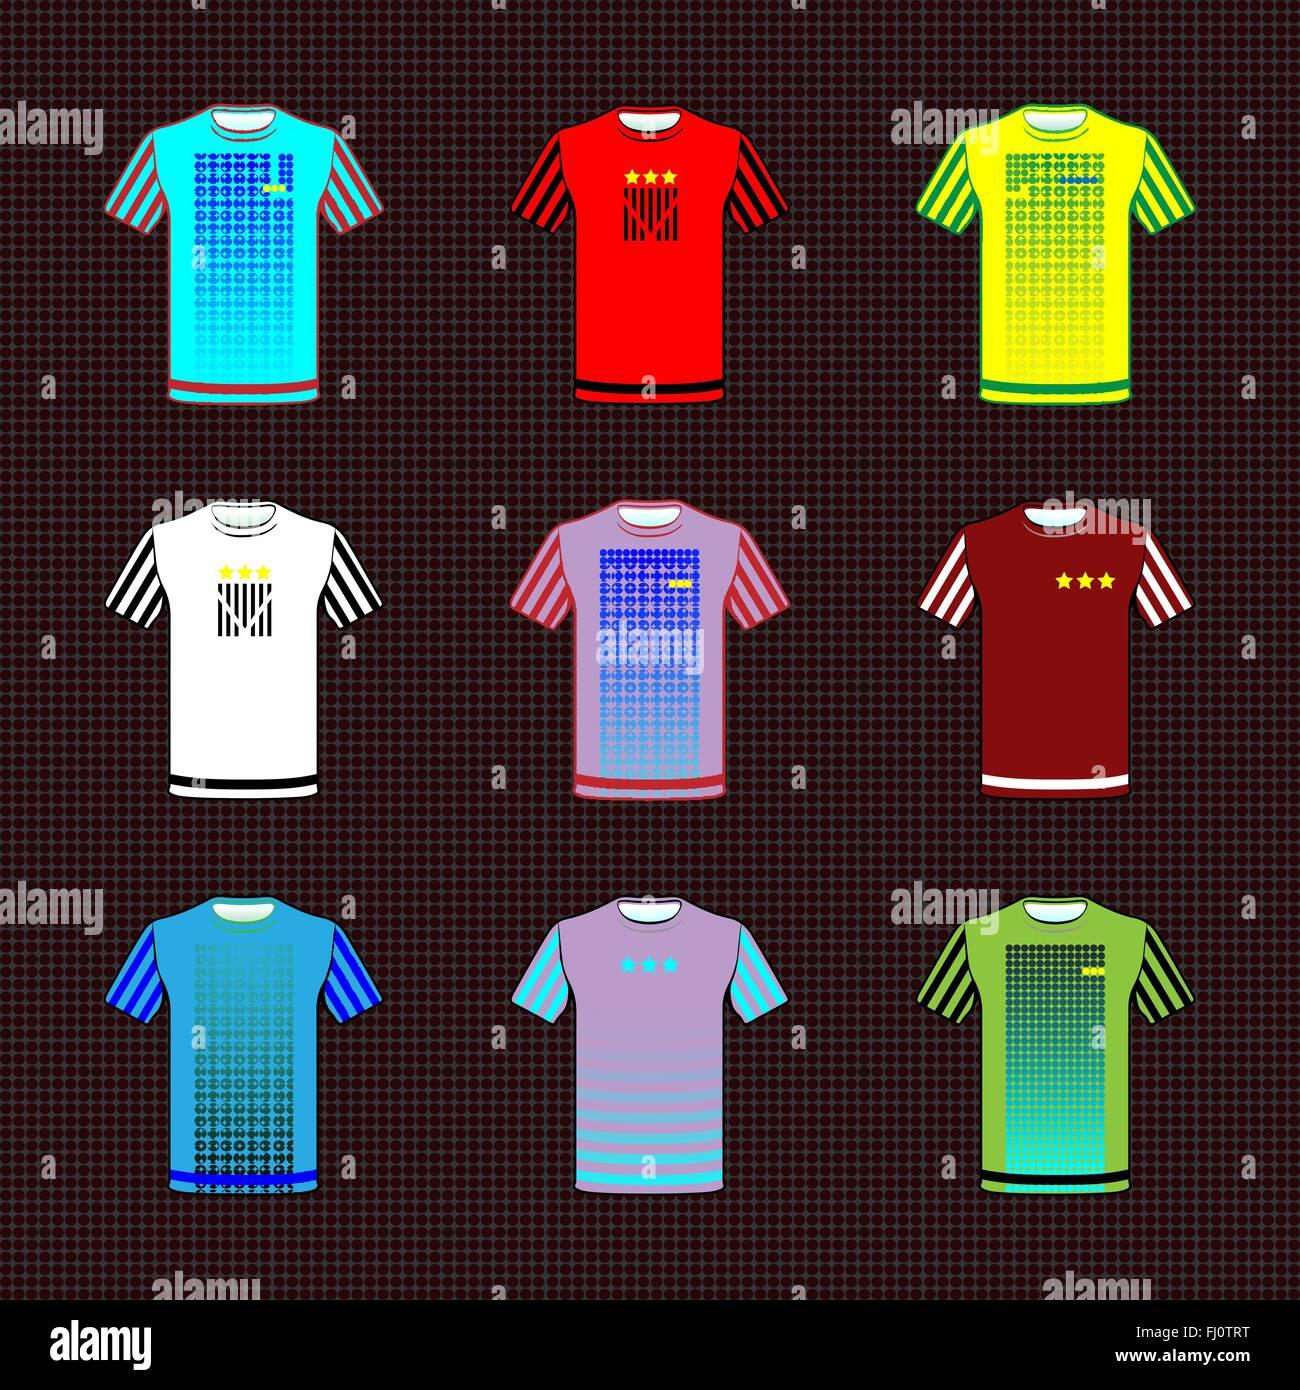 Shirt uniform design vector - Football Soccer Baseball Volleyball Team Sportswear Uniform Stylish Design For Players T Shirts Front View Vector